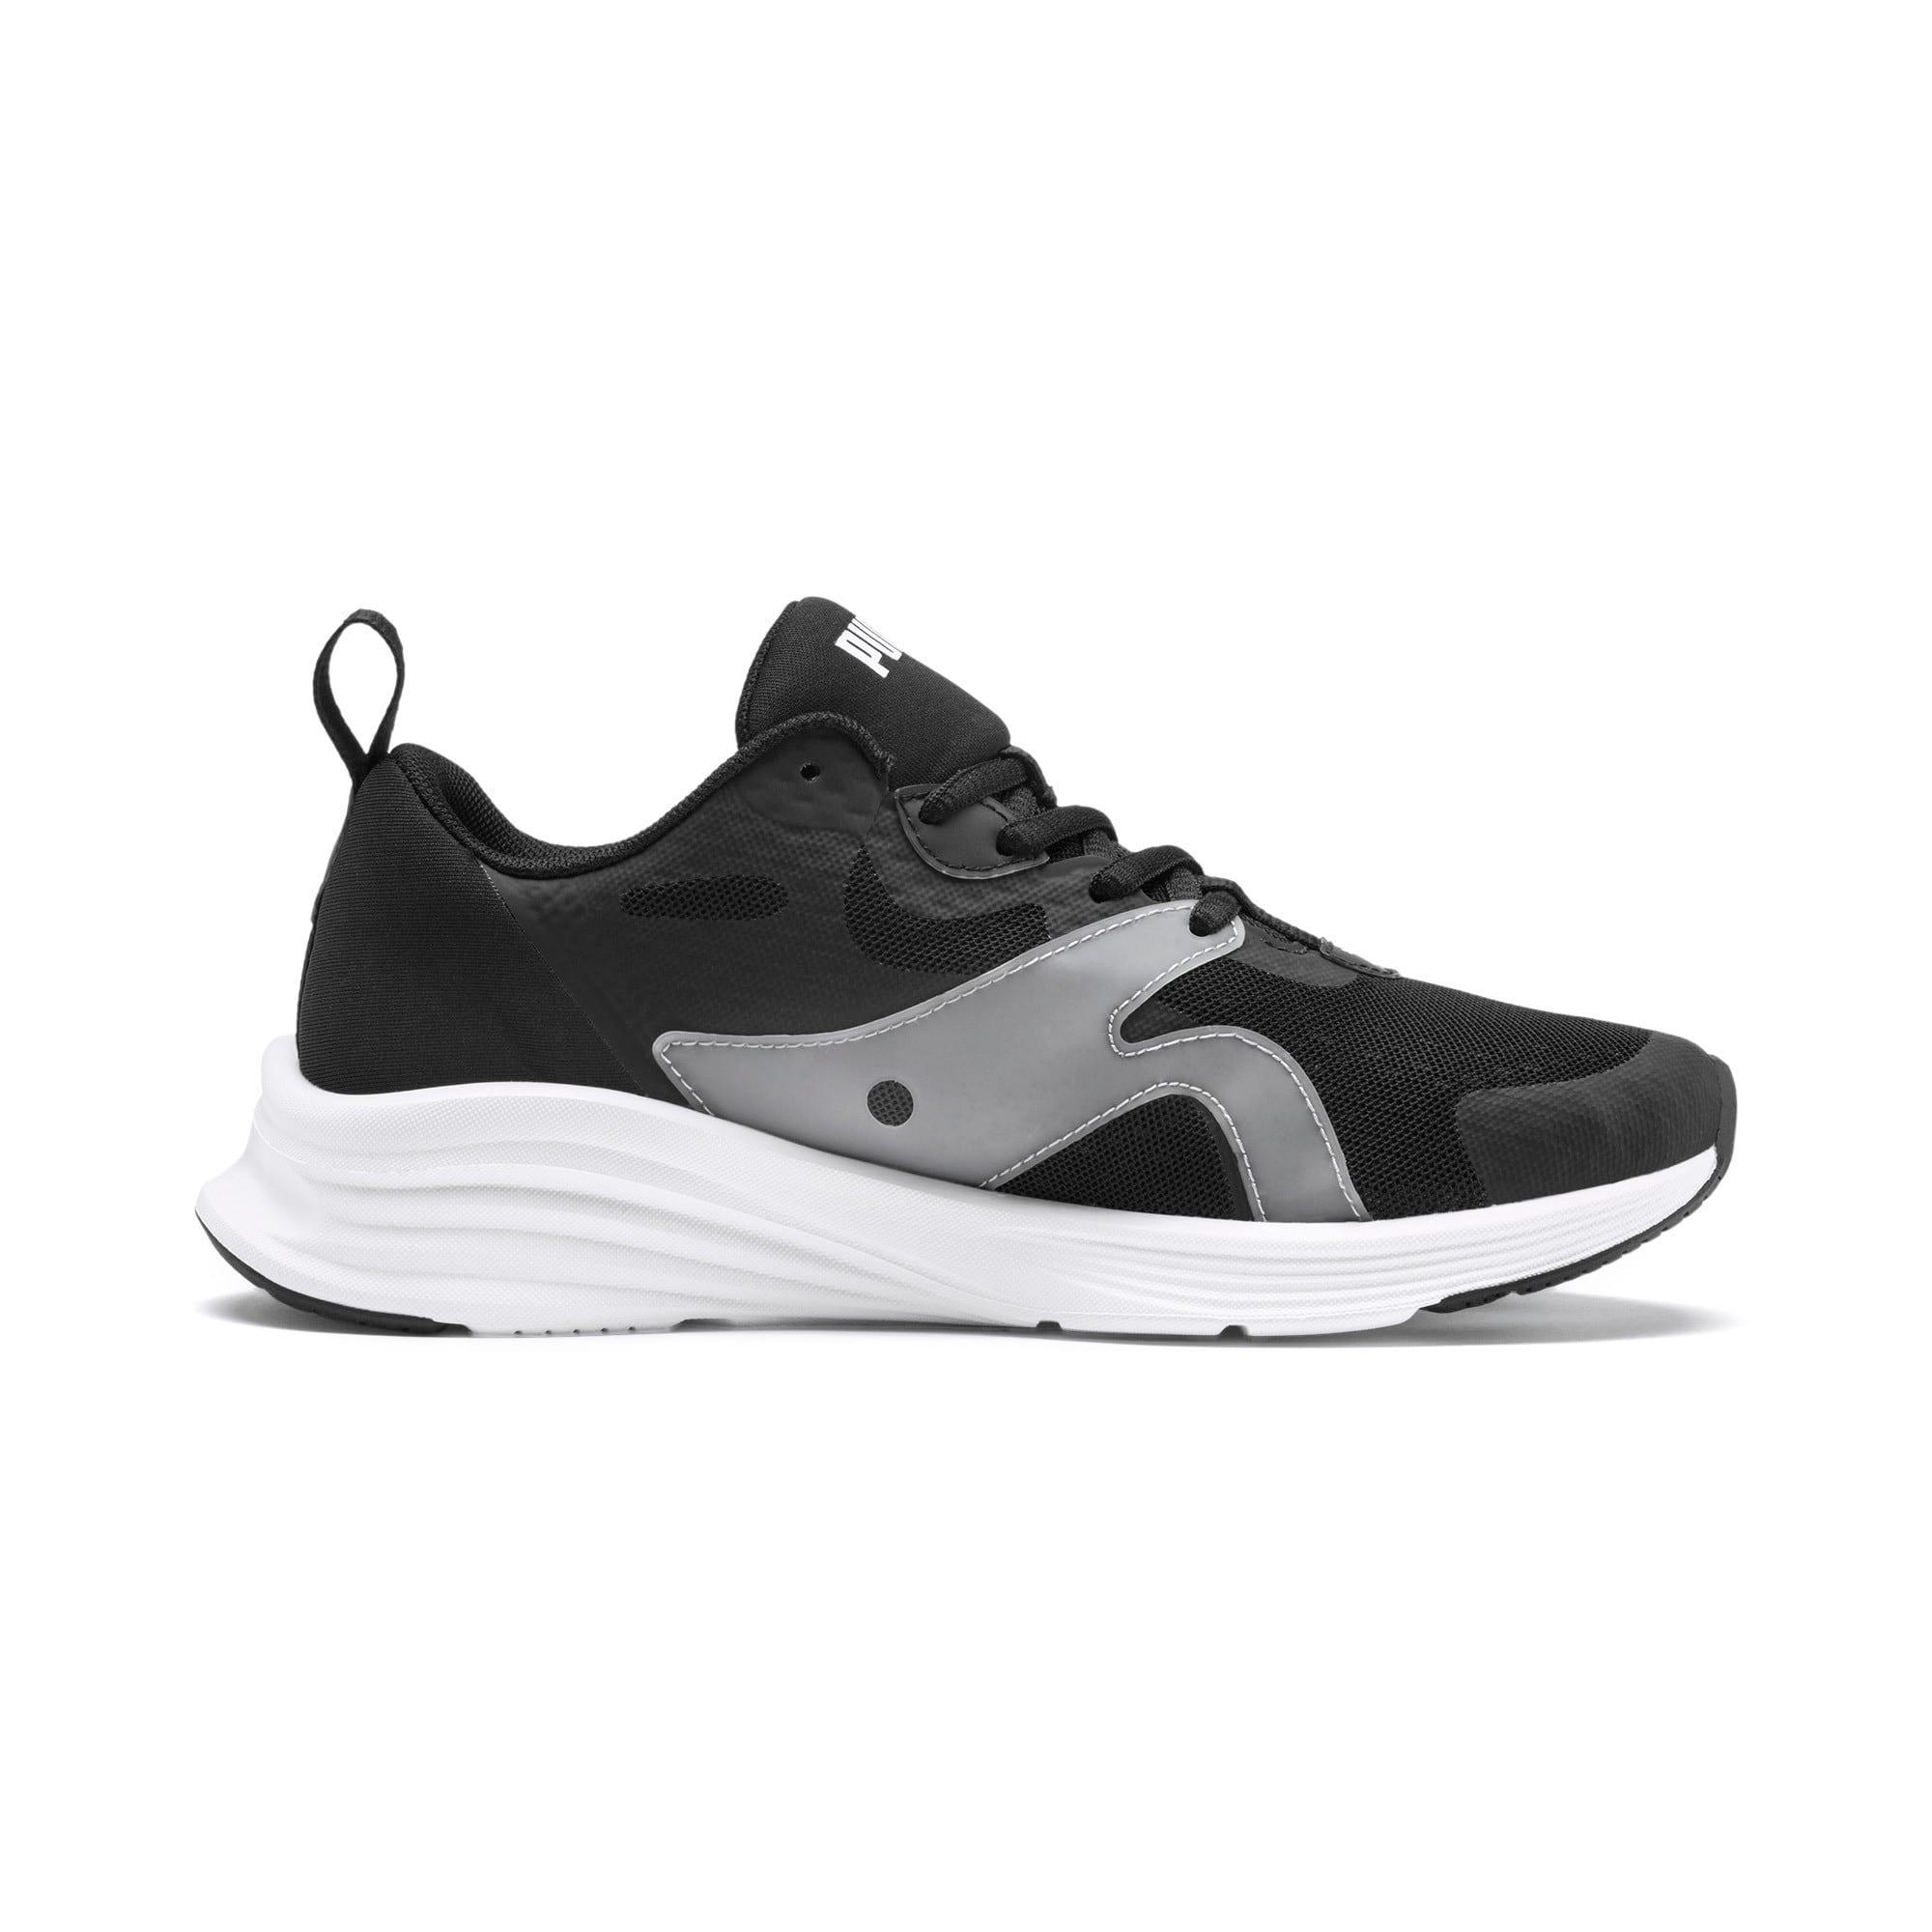 Thumbnail 5 of HYBRID Fuego Running Shoes JR, Puma Black-Puma White, medium